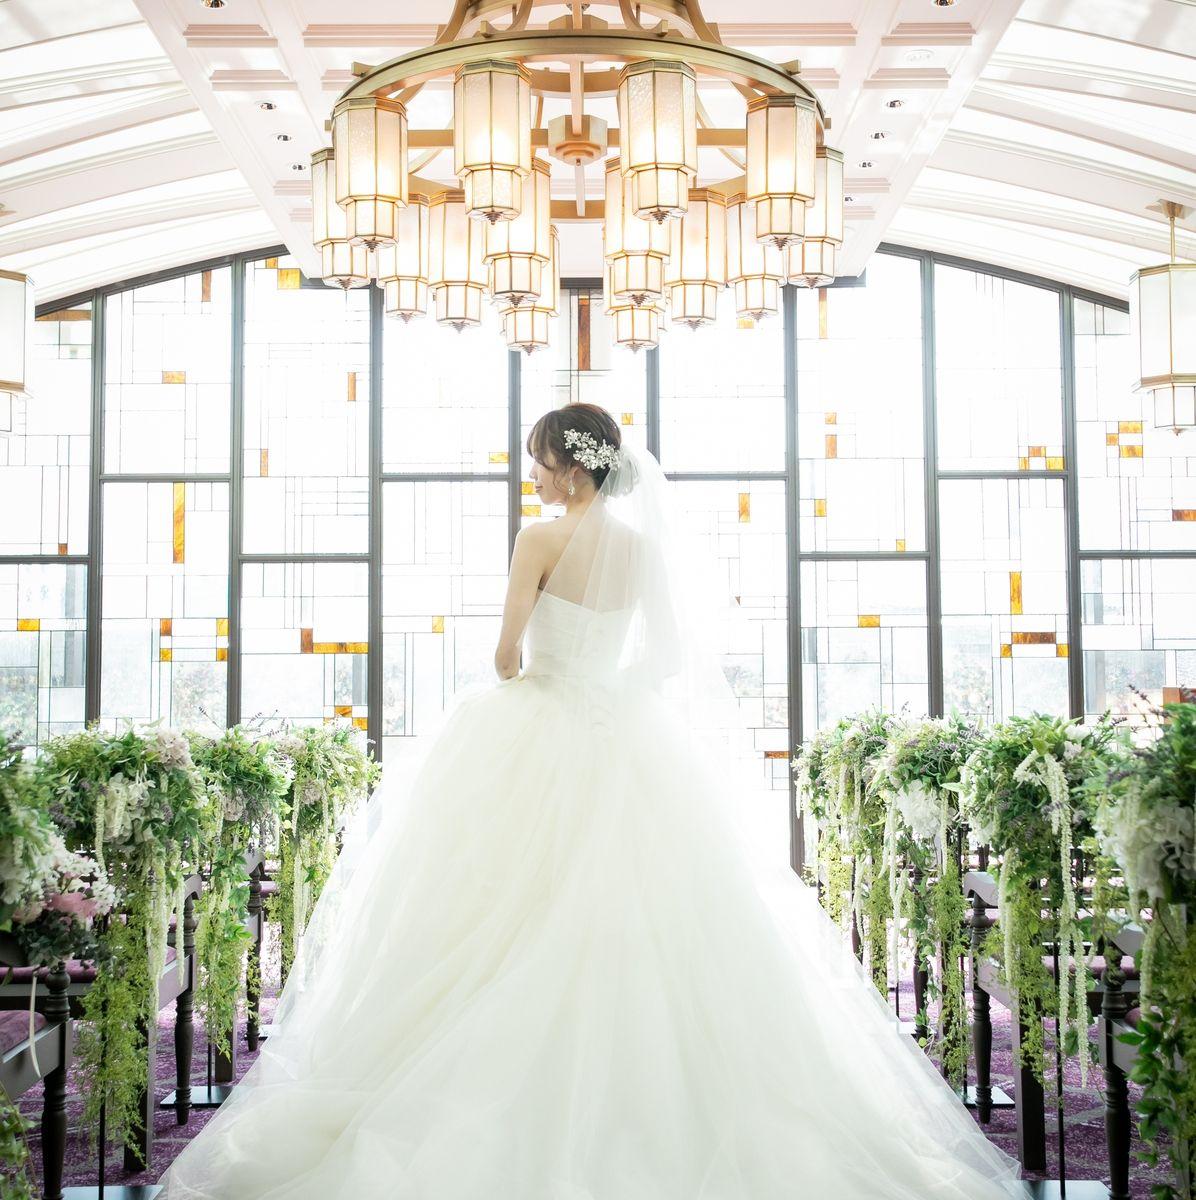 e.r.n.weddingさんのザ・コンダーハウス(THE CONDER HOUSE)写真1枚目